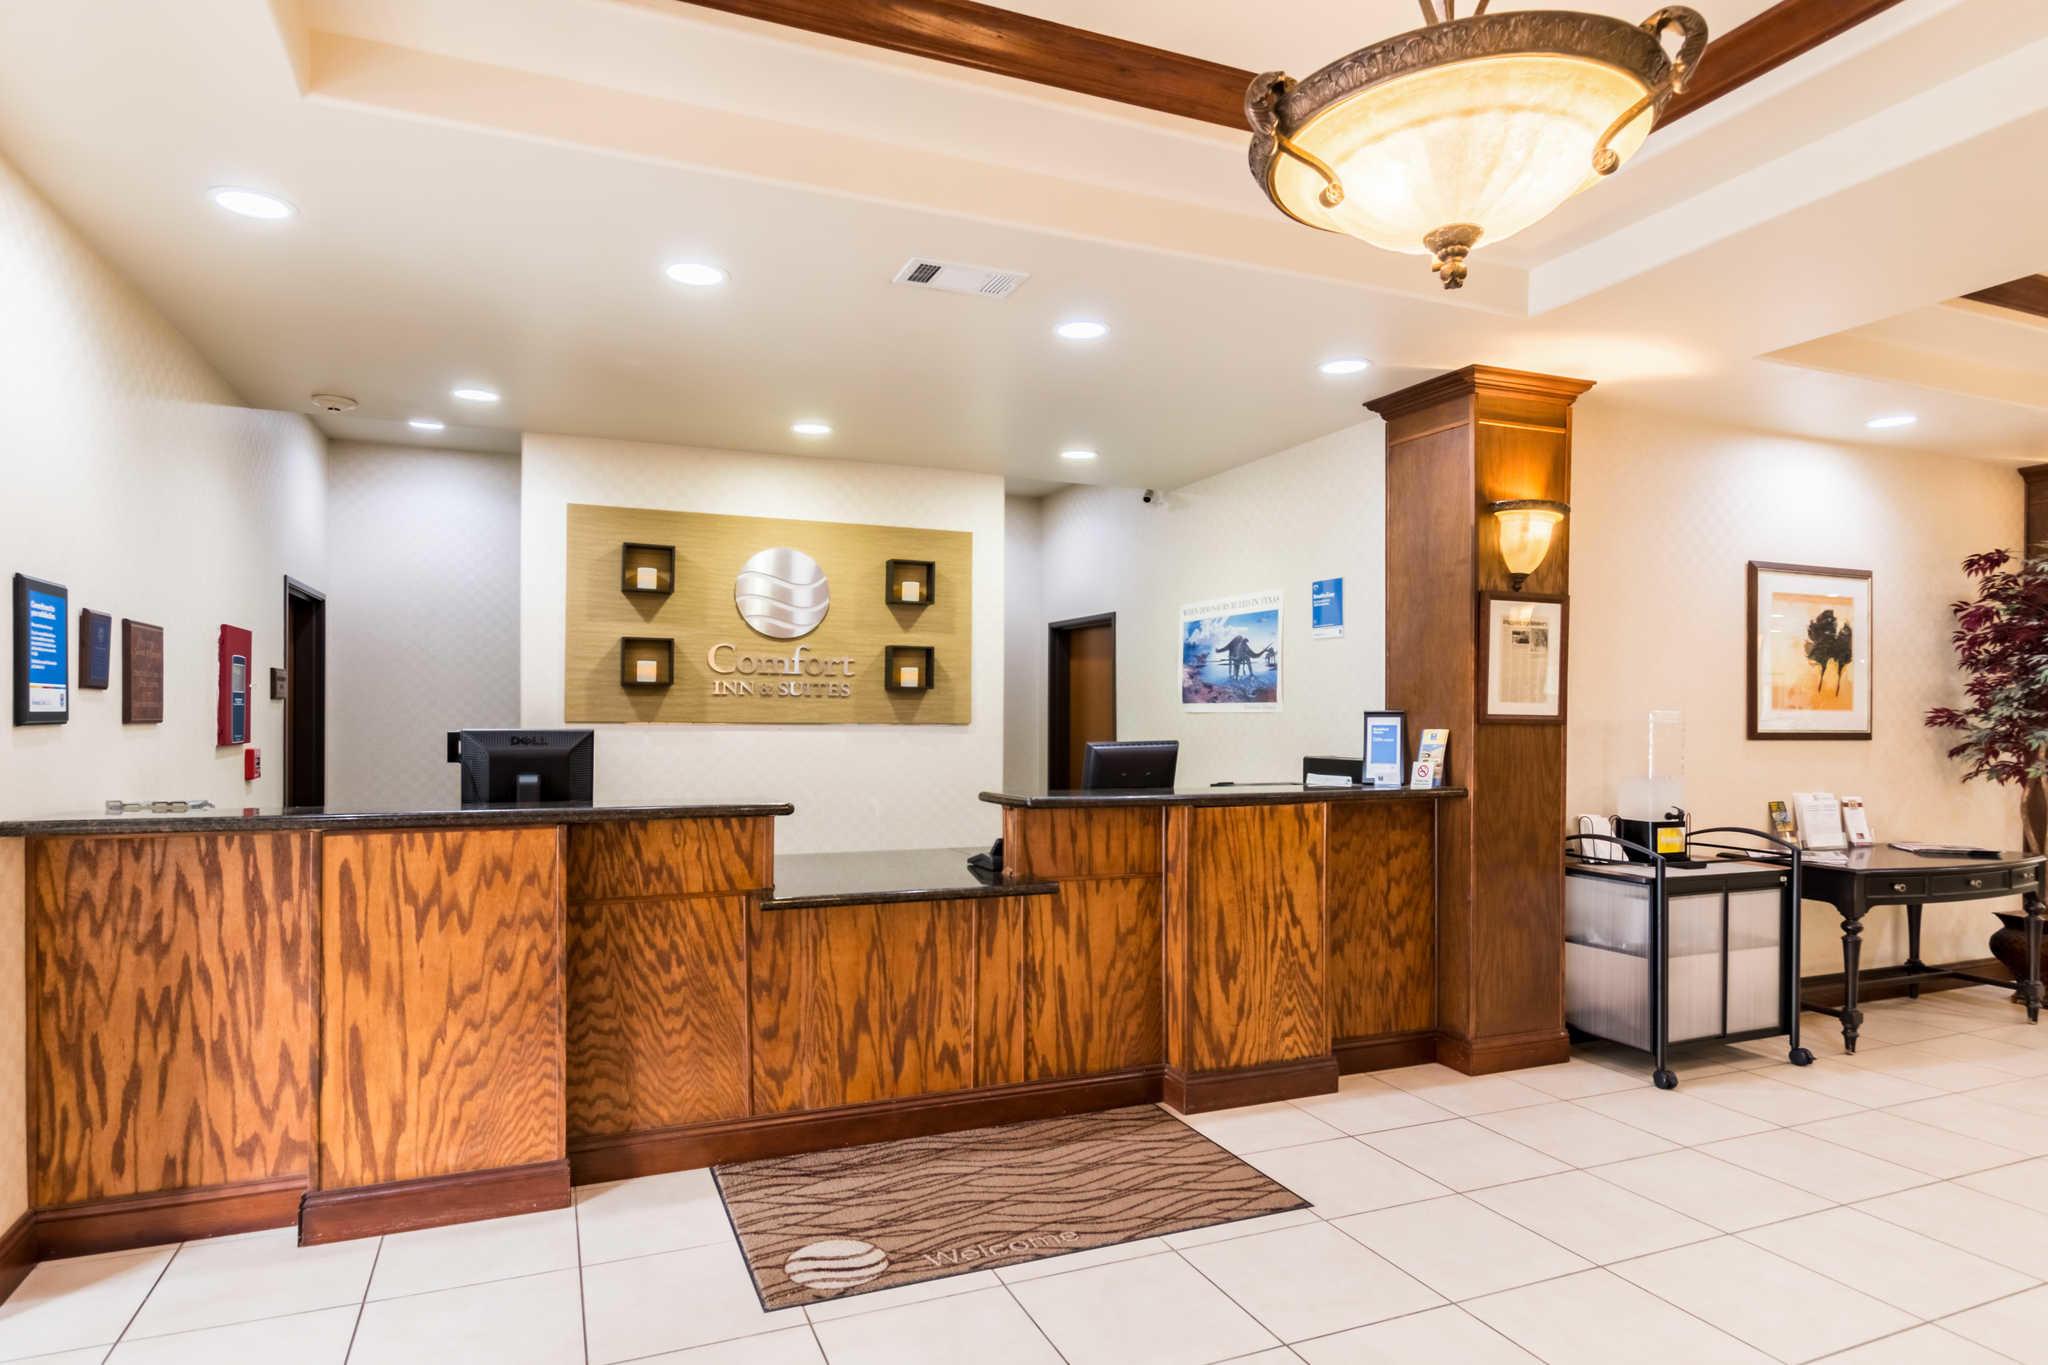 Comfort Inn & Suites near Comanche Peak image 2